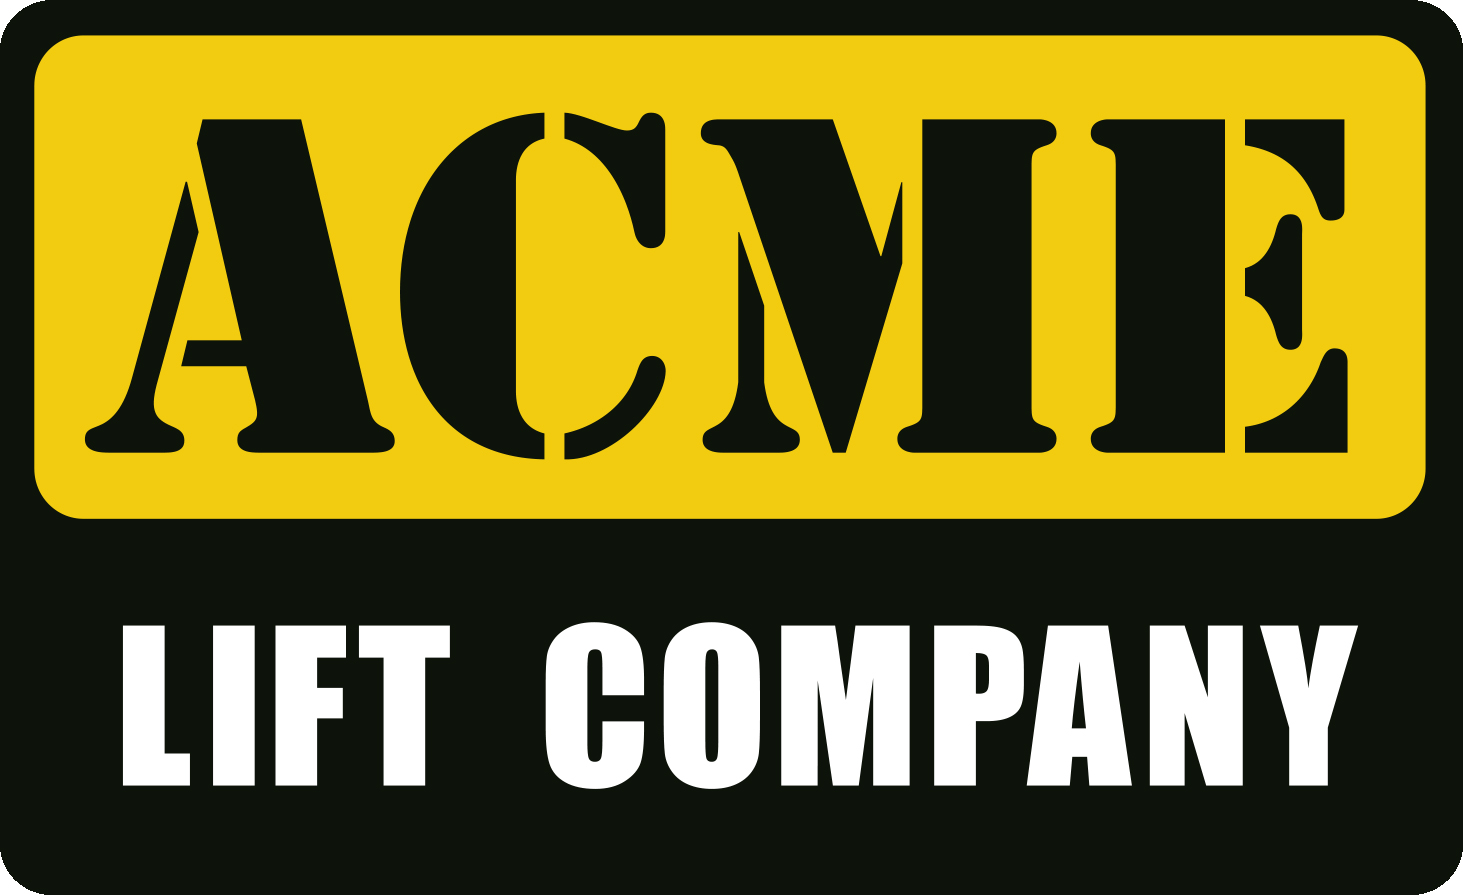 acme-lift-company.jpg